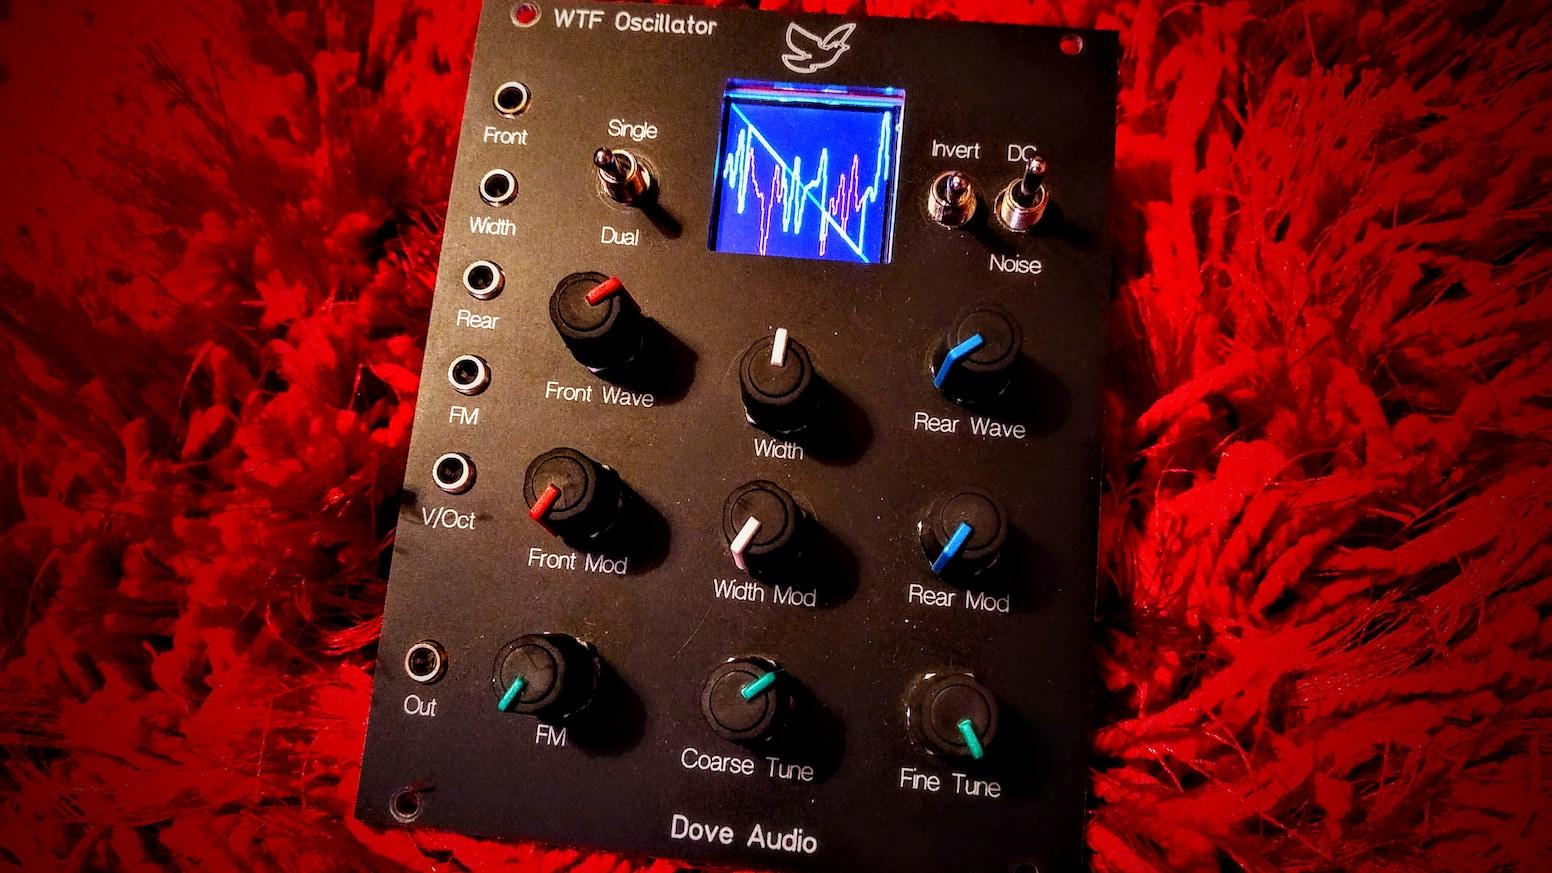 Dove Audio Window Transform Function (WTF) Oscillator - For euro-rack or MU format modular synth.